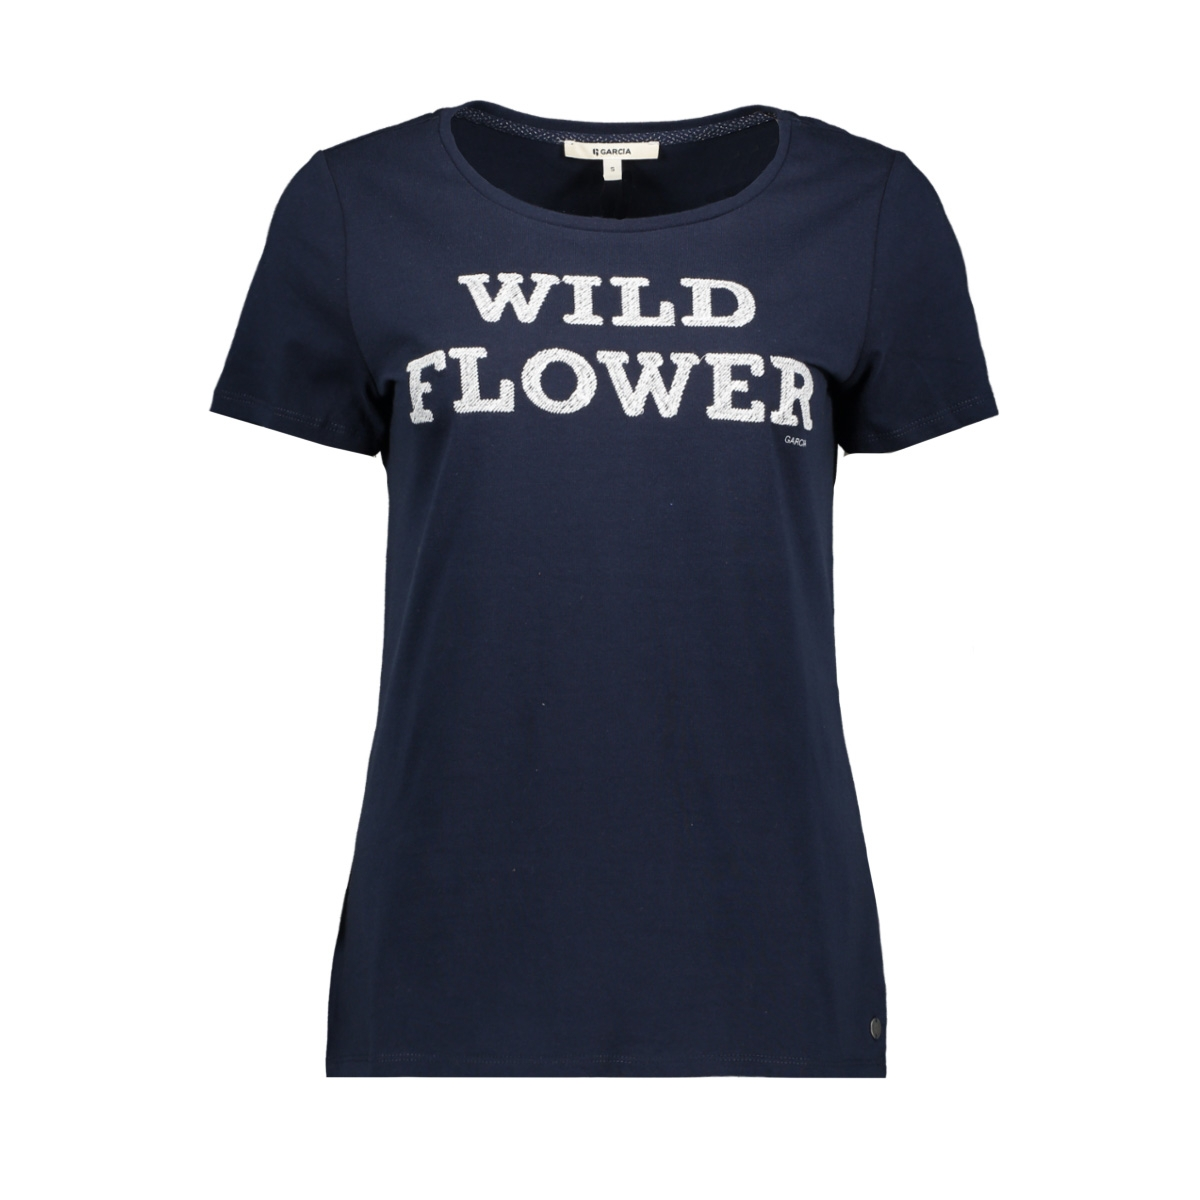 t shirt met tekst h90203 garcia t-shirt 292 dark moon